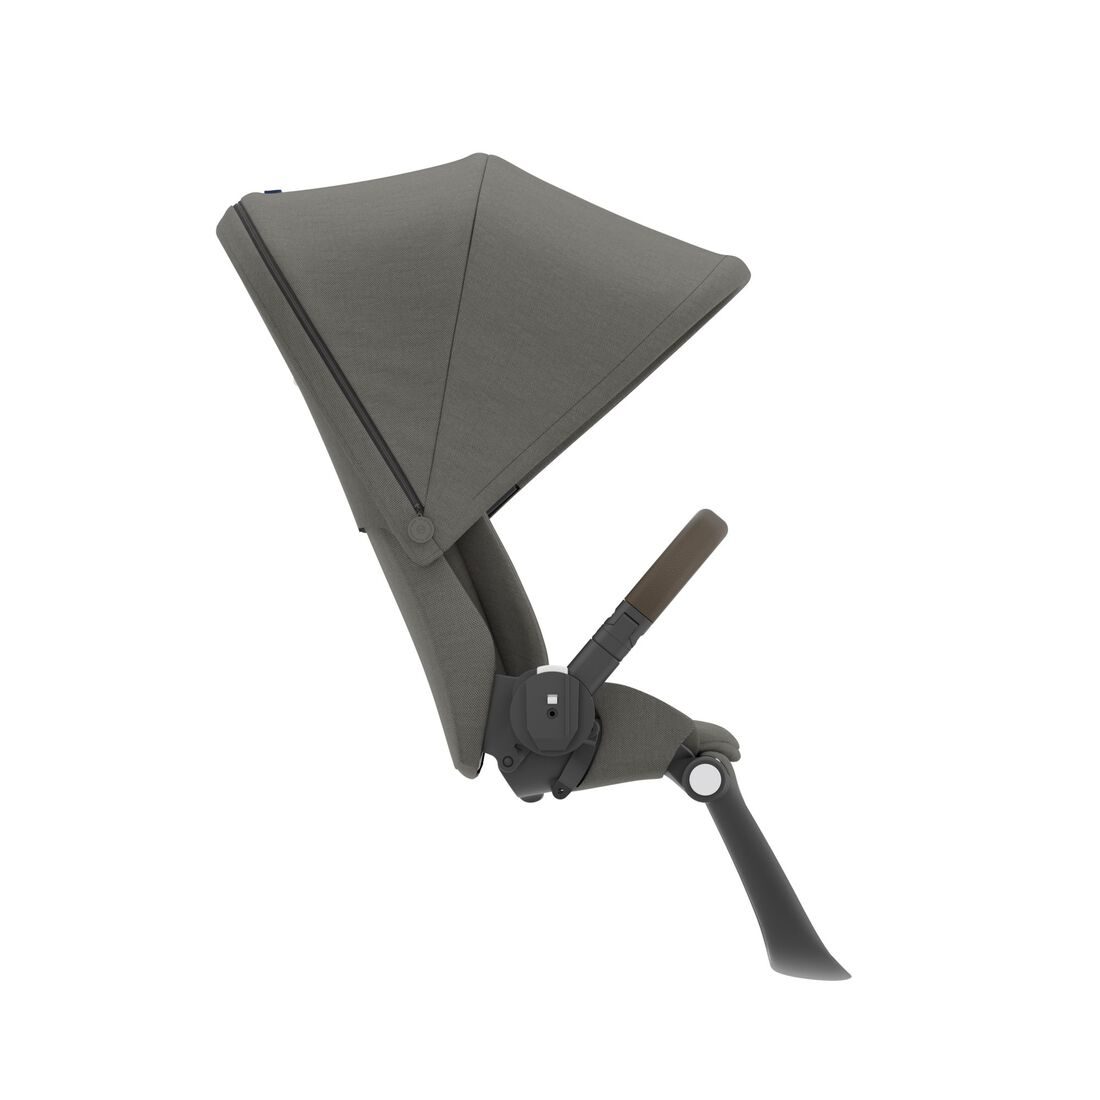 CYBEX Gazelle S Sitzeinheit - Soho Grey (Taupe Frame) in Soho Grey (Taupe Frame) large Bild 2